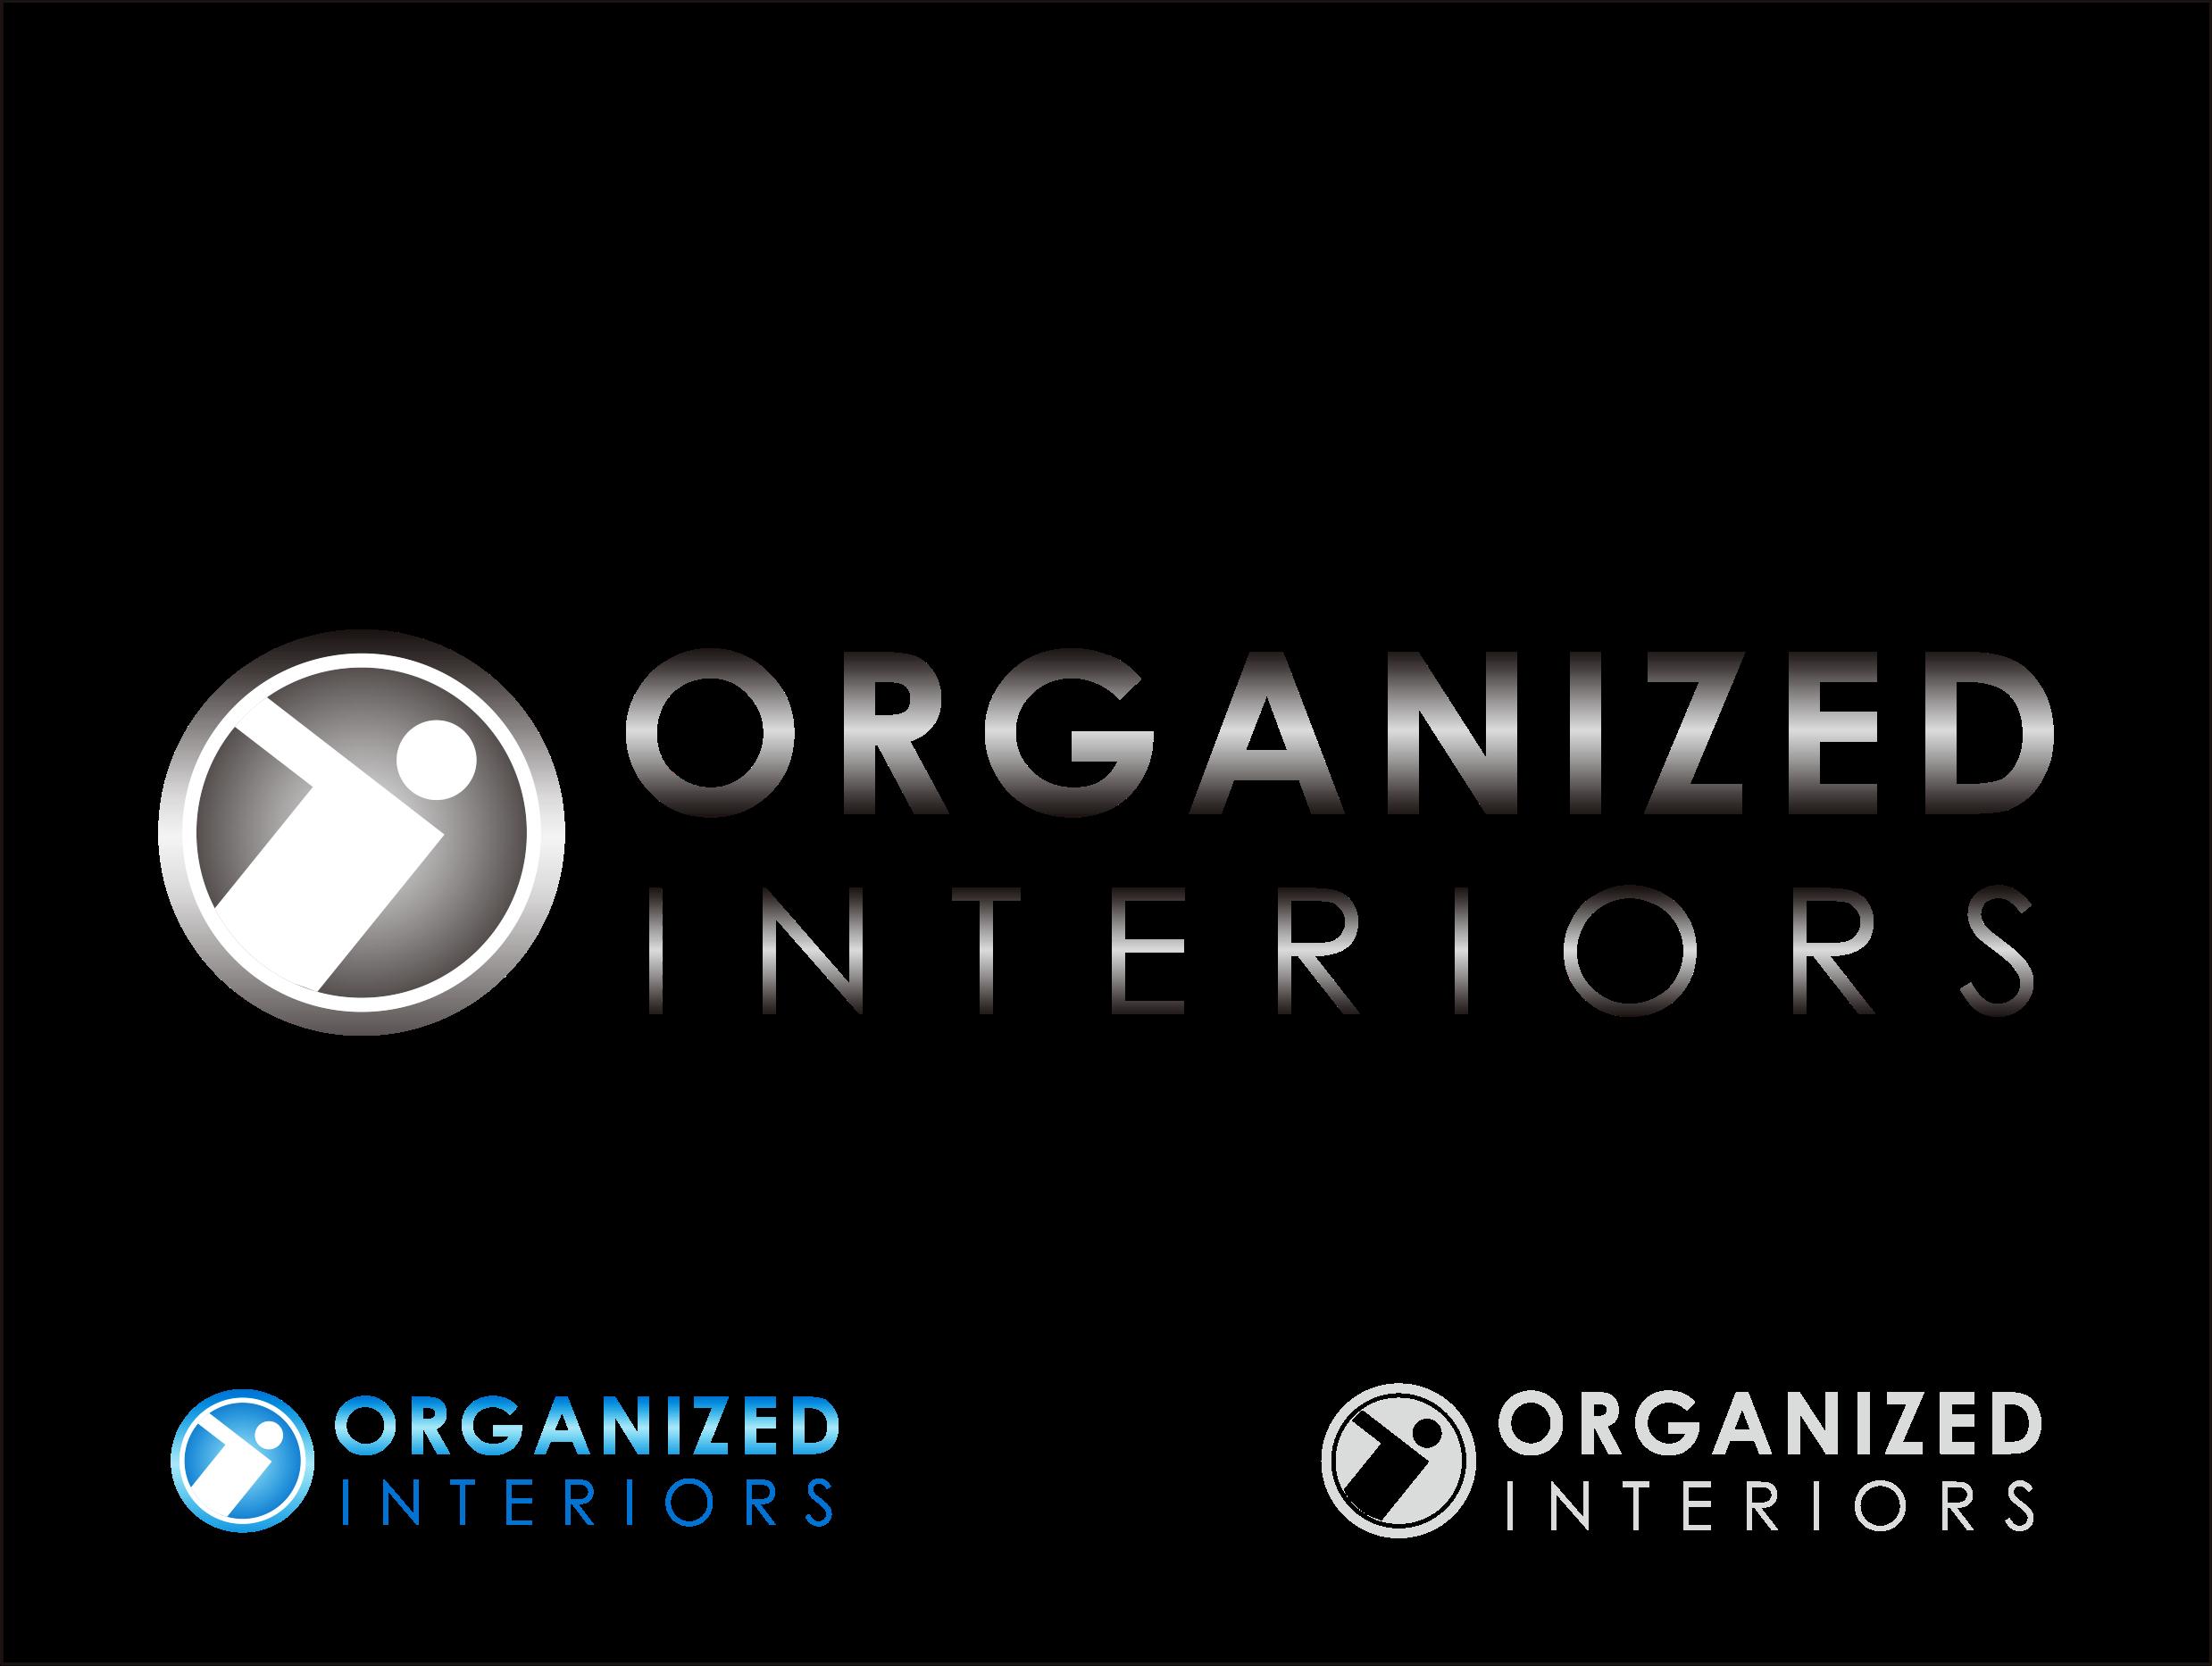 Logo Design by Armada Jamaluddin - Entry No. 47 in the Logo Design Contest Imaginative Logo Design for Organized Interiors.